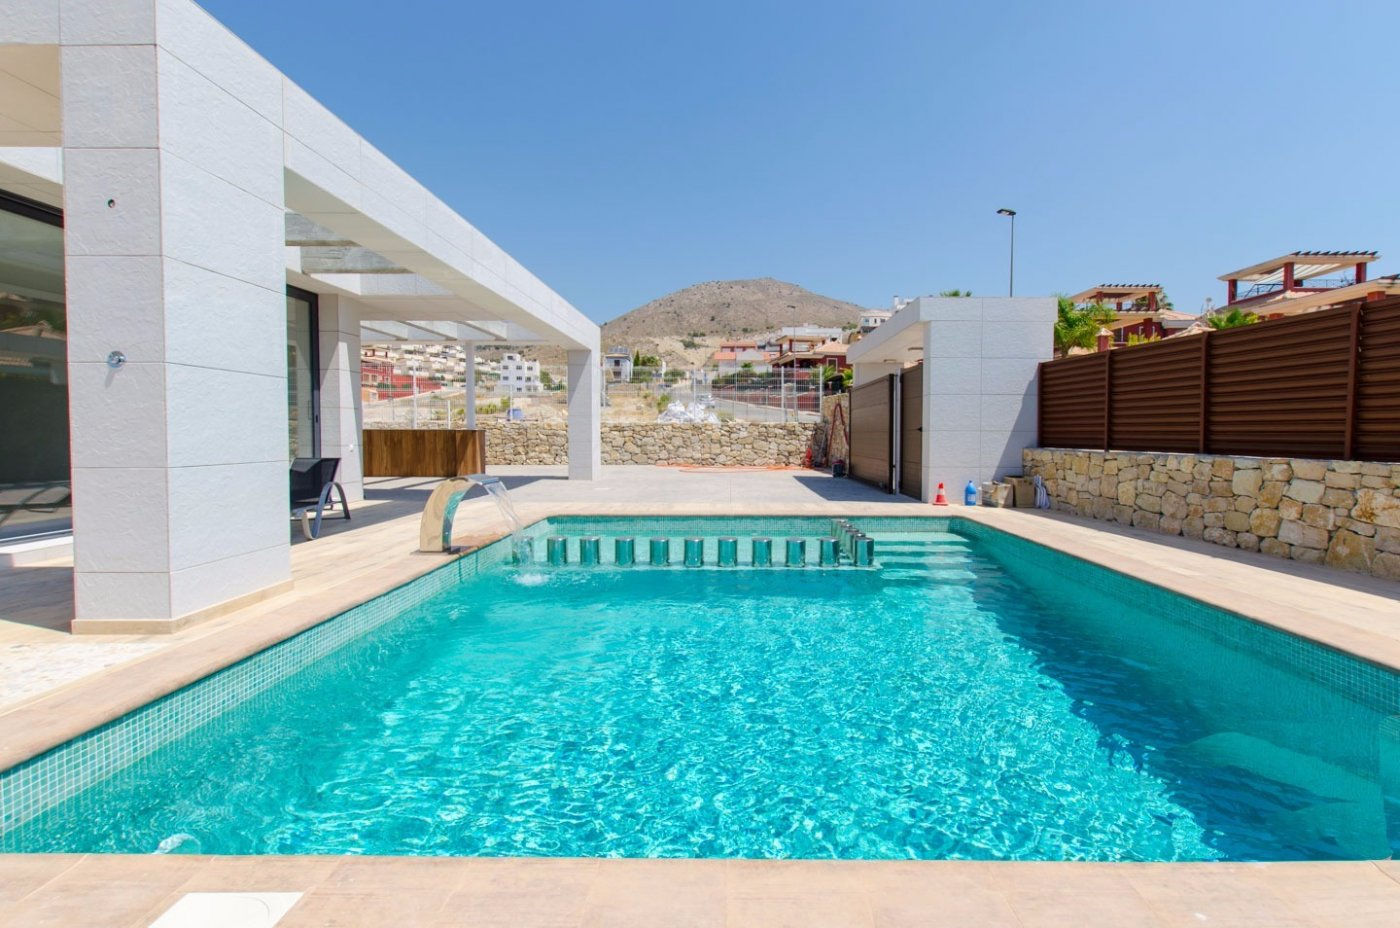 Villas modernas en balcÓn de finestrat a un paso de benidorm!!! - imagenInmueble32